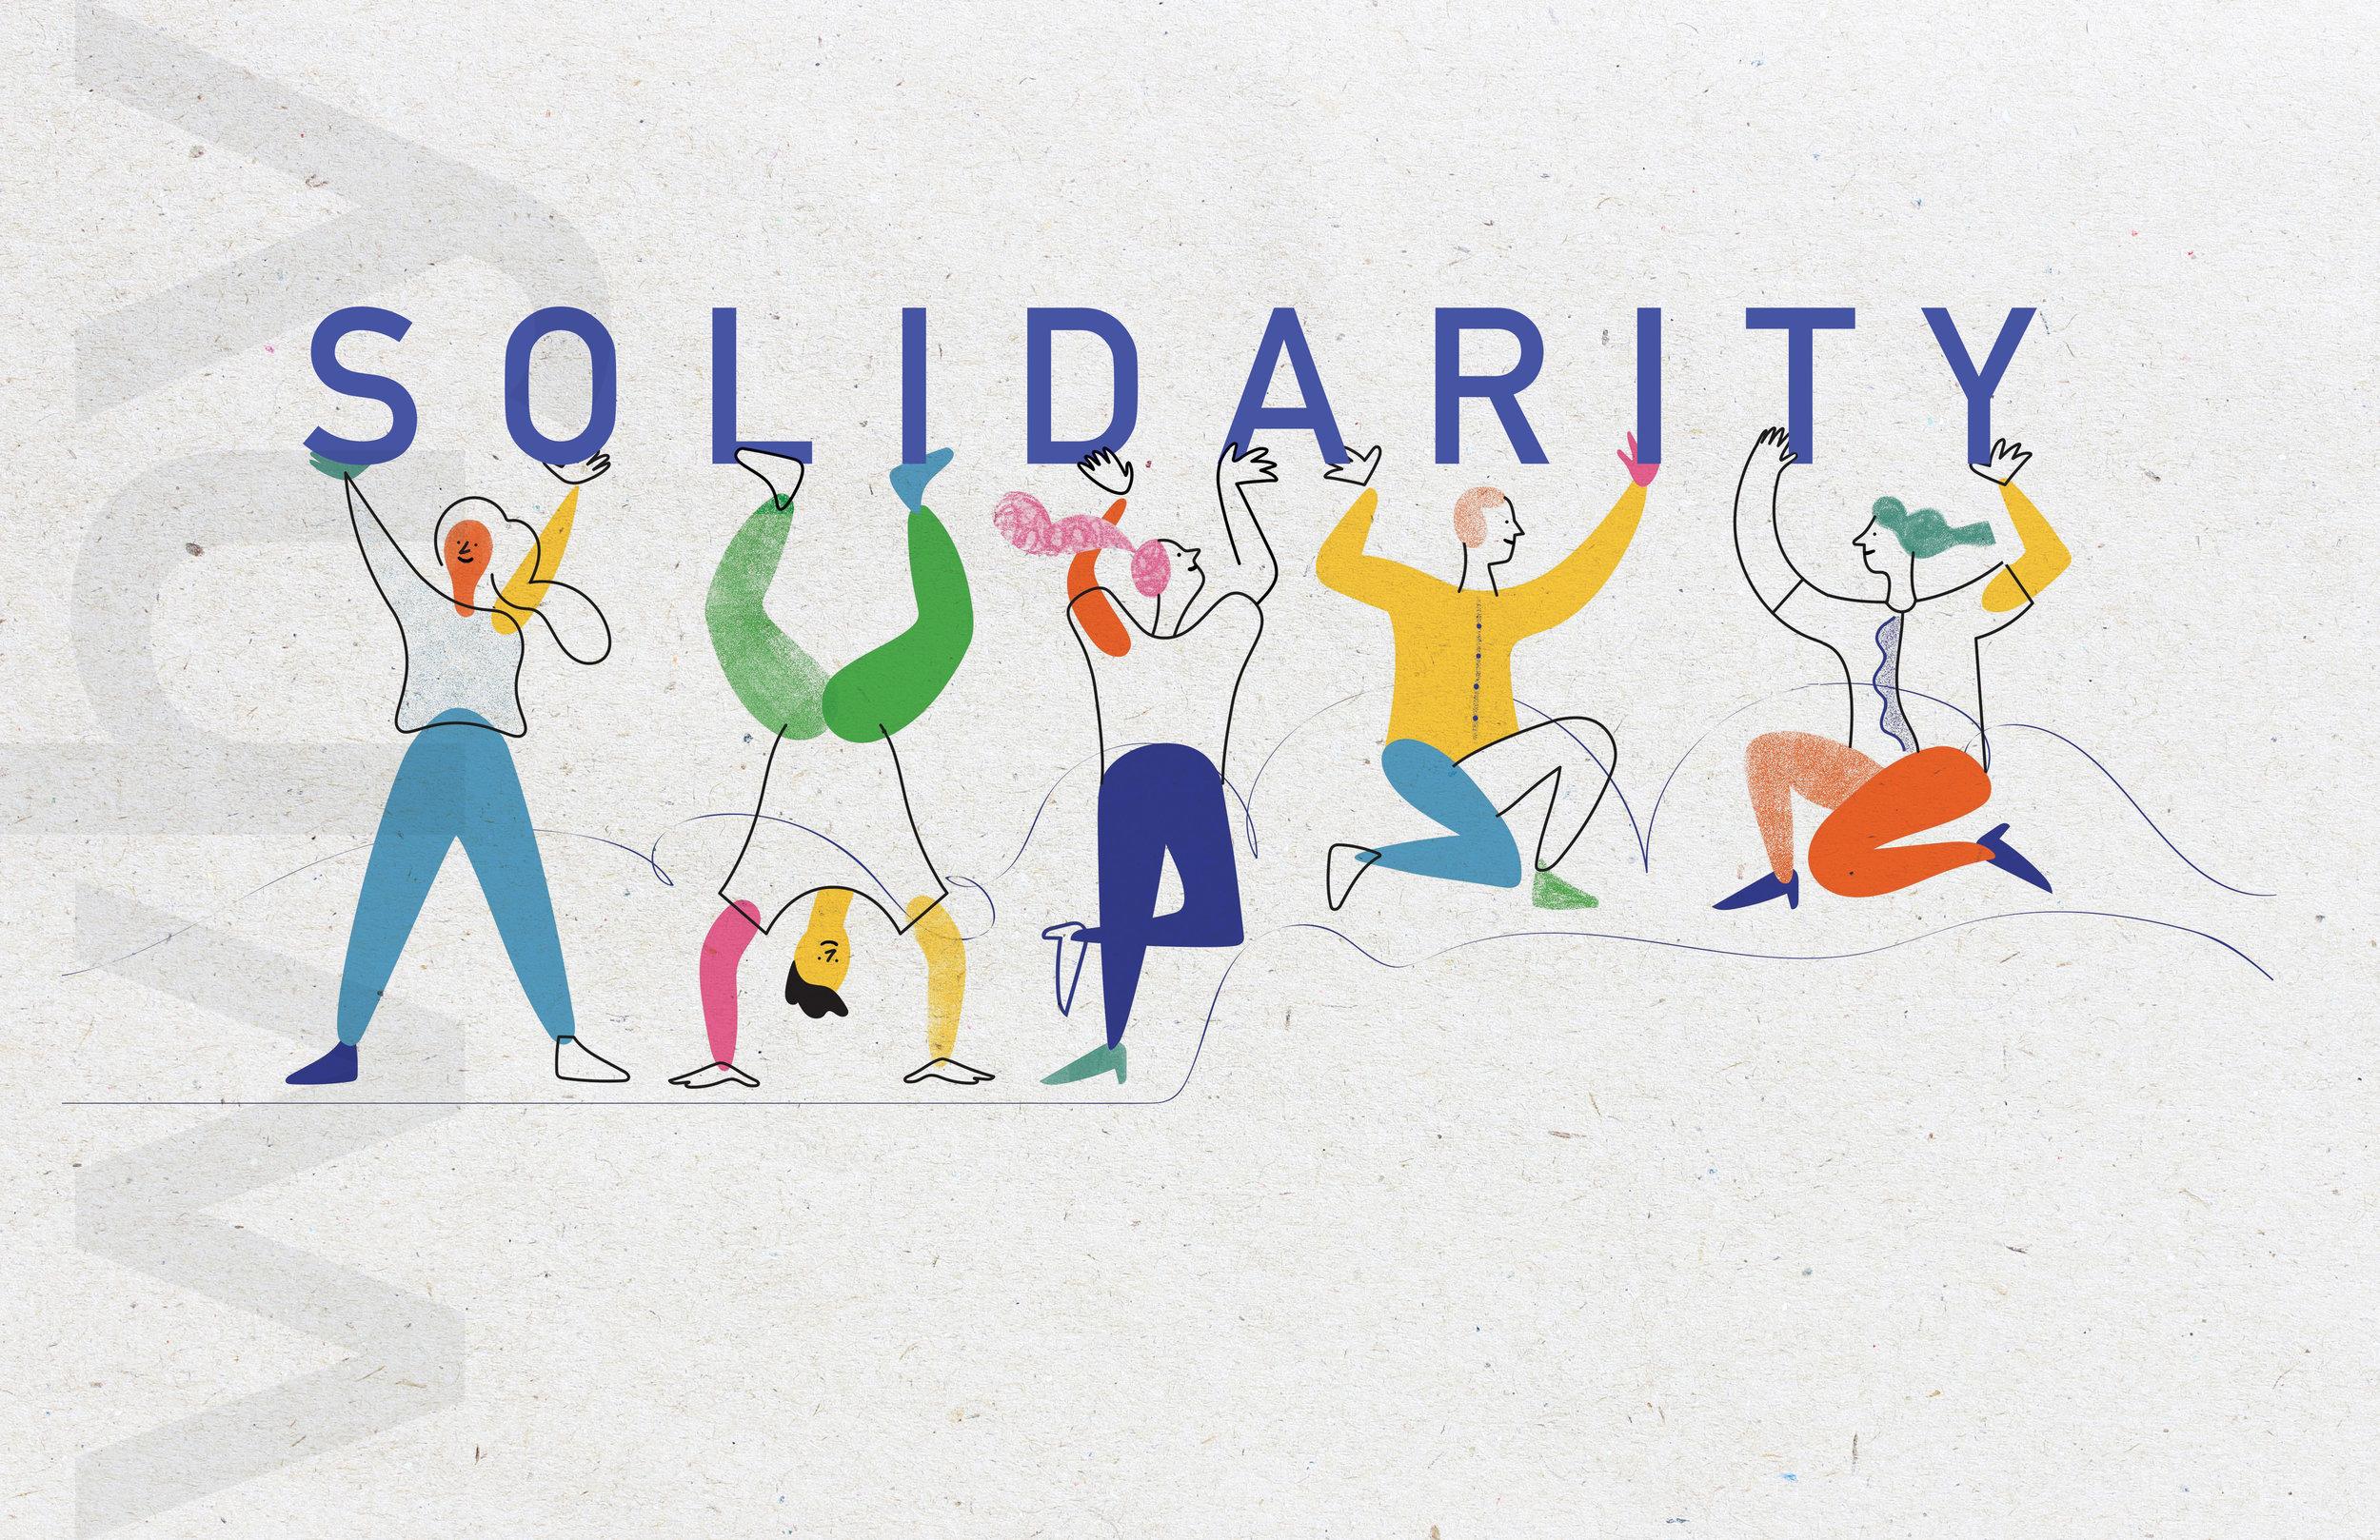 MANAUS_Solidarity_nocopy.jpg